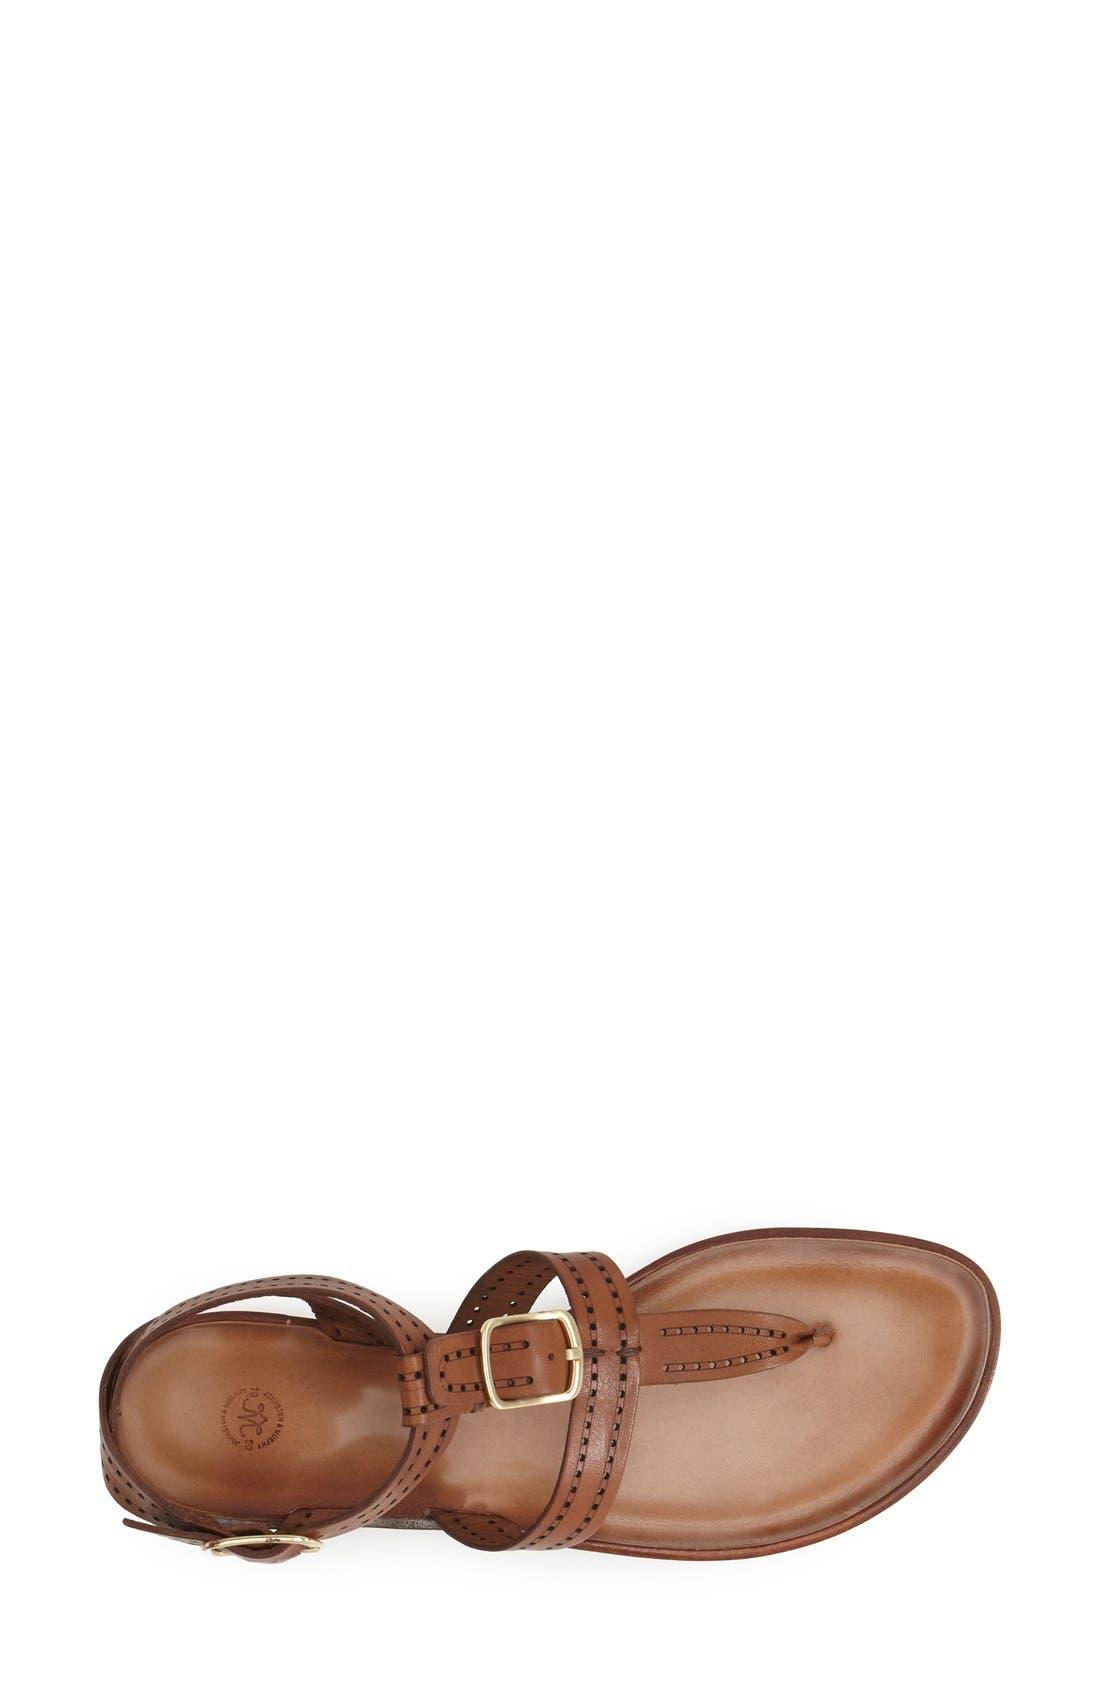 Alternate Image 3  - Johnston & Murphy 'Patti' Perforated Leather Thong Sandal (Women)